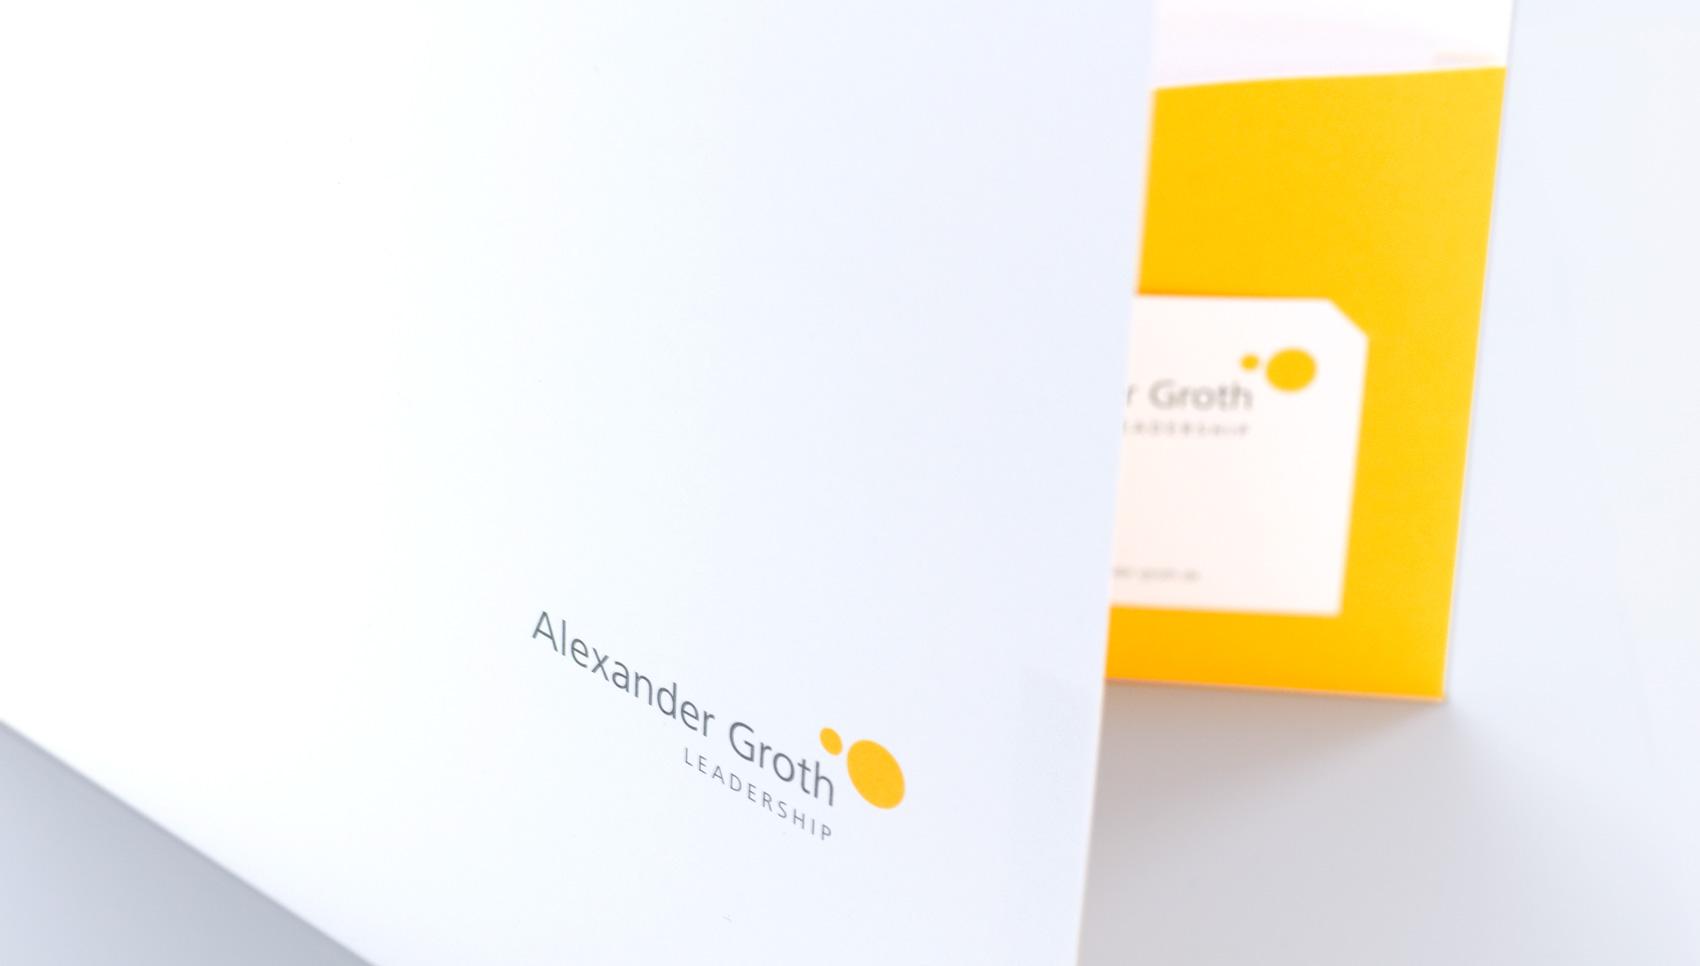 Alexander Groth Leadership Dreieich